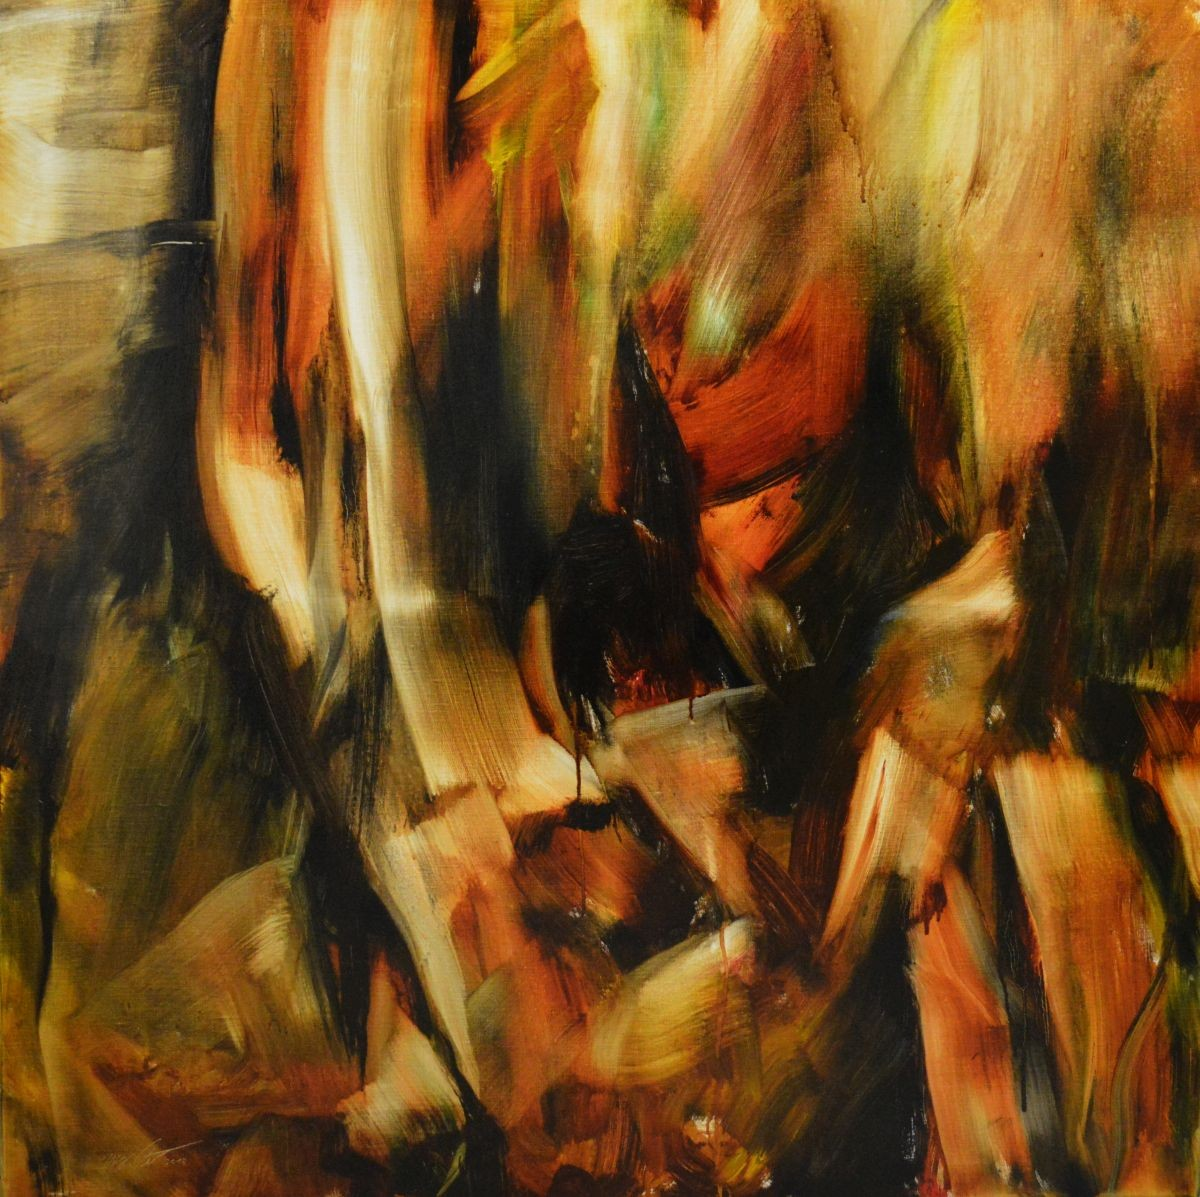 Öl auf Leinwand, 2015 100x100cm